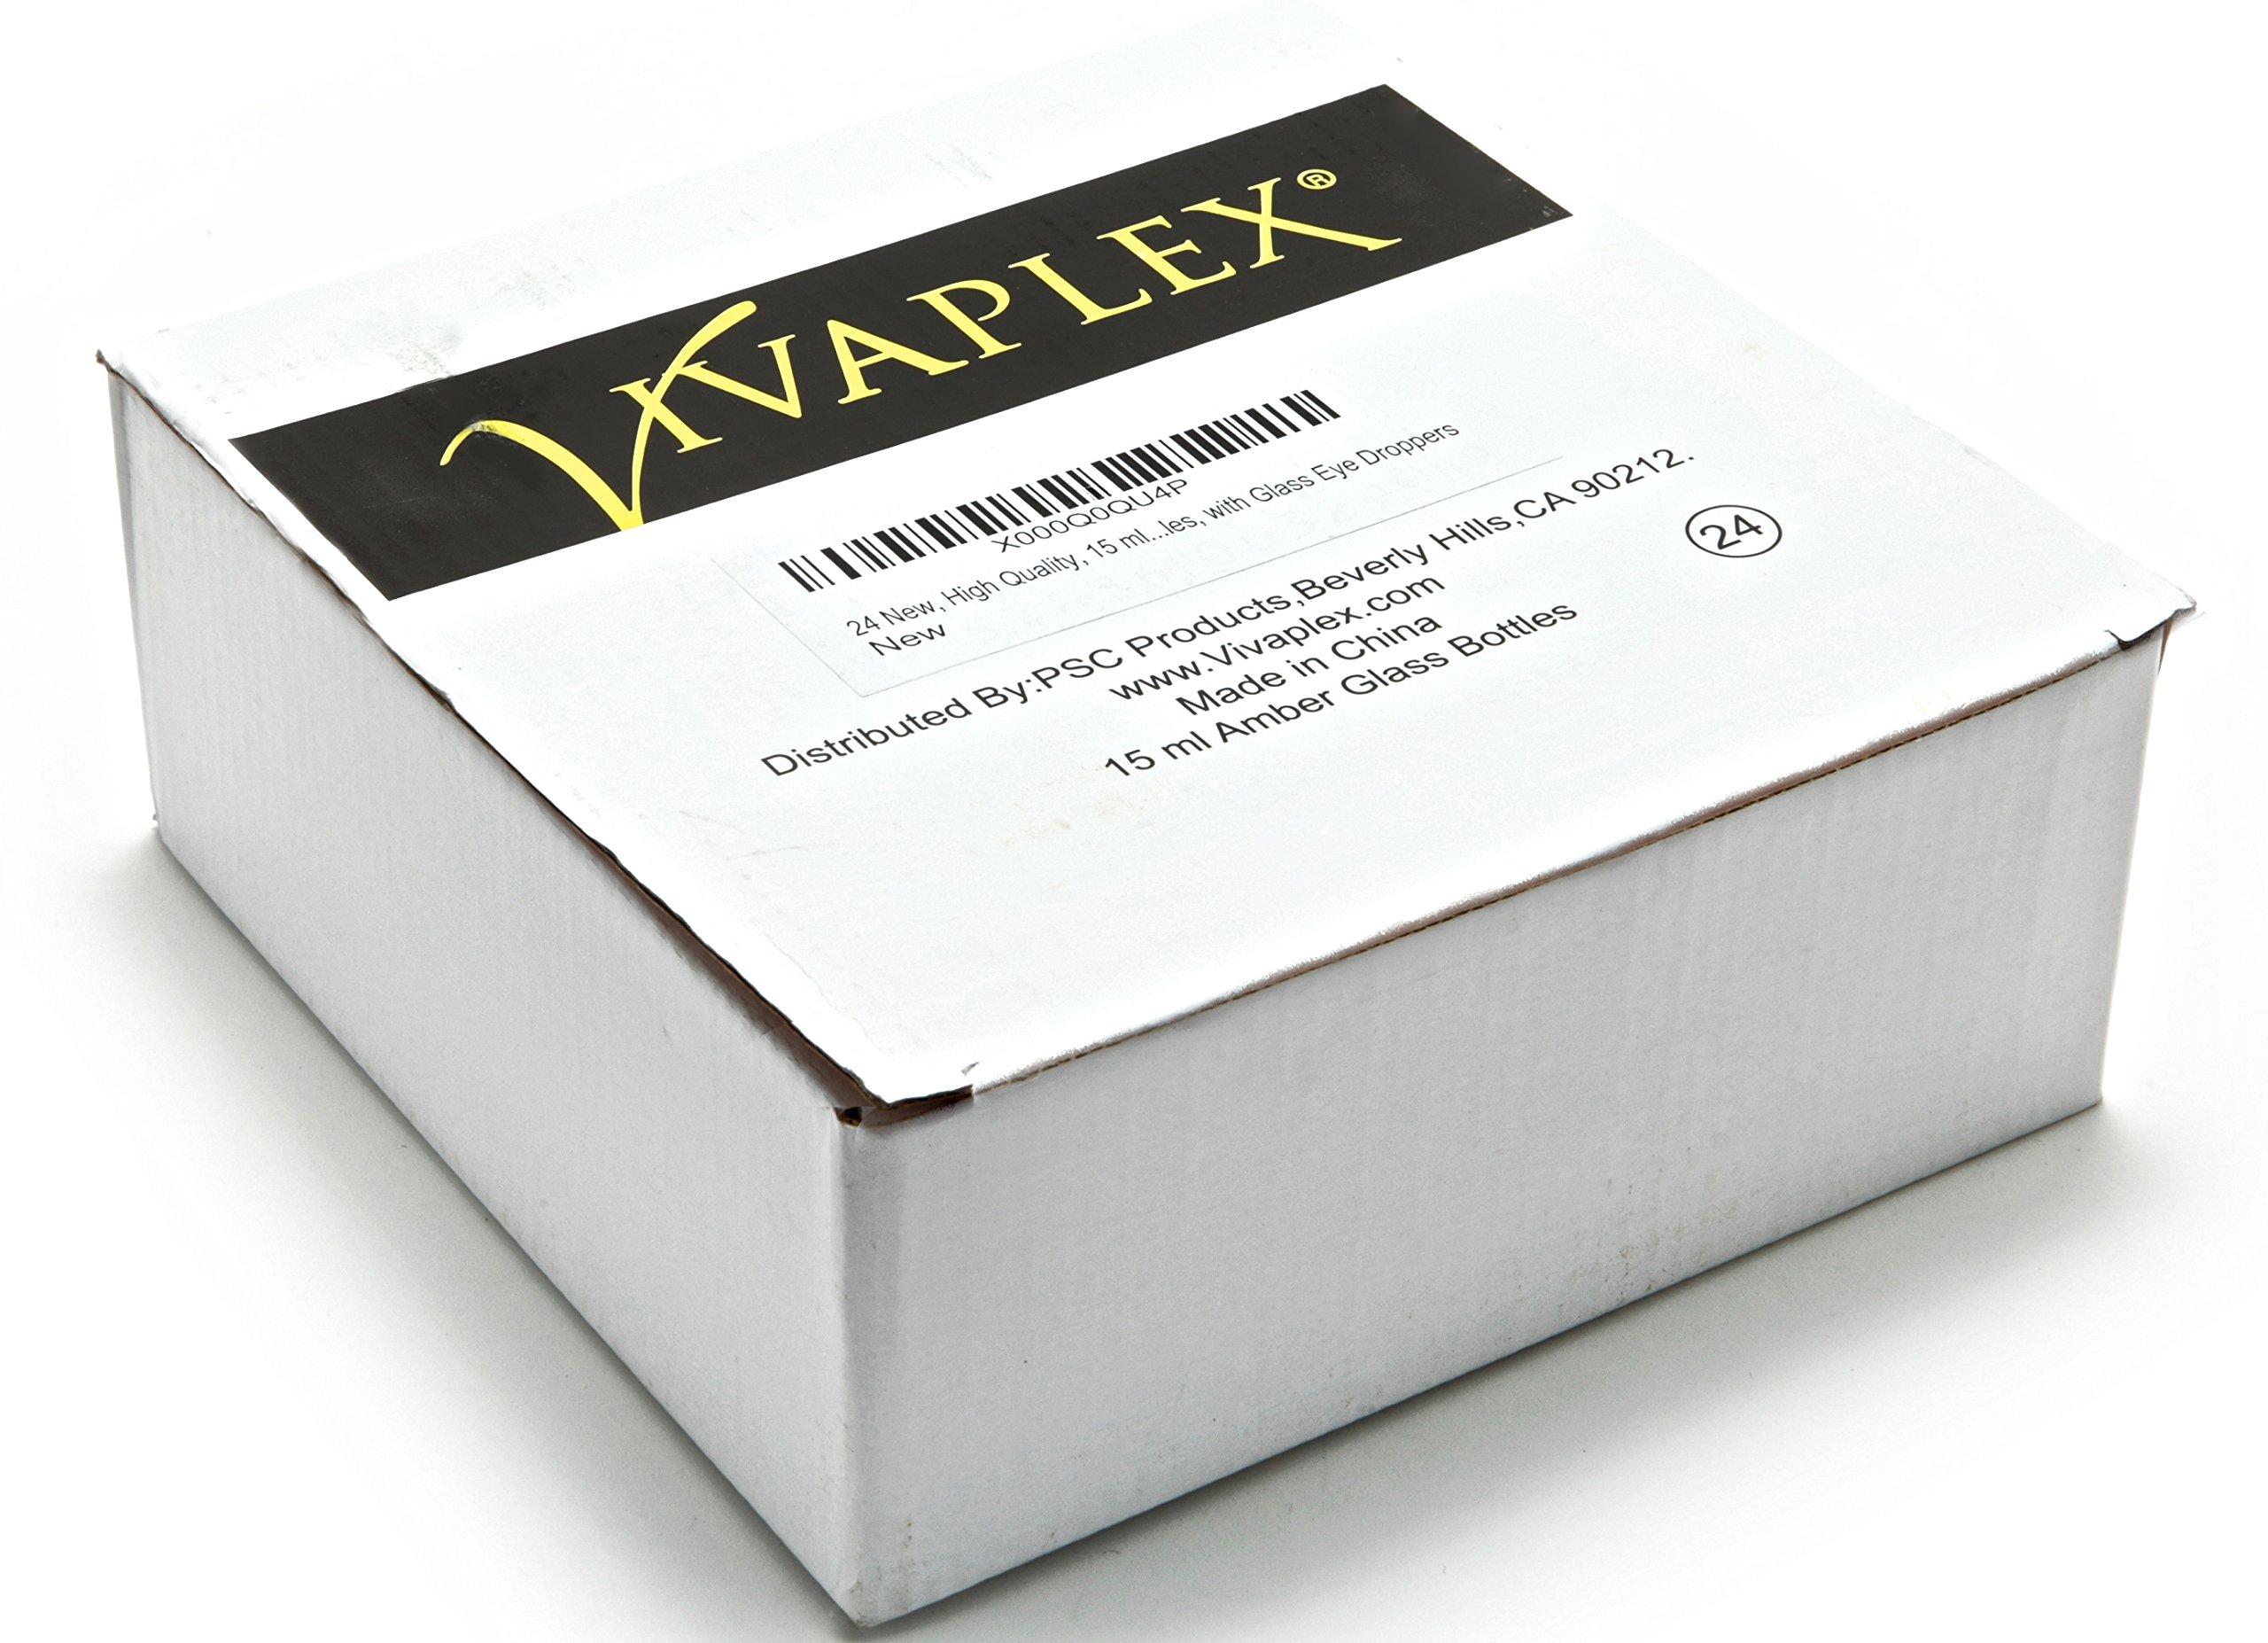 Vivaplex VAD15-24 24, Amber, 15 ml (1/2 oz) Glass Bottles, with Glass Eye Droppers by Vivaplex (Image #2)